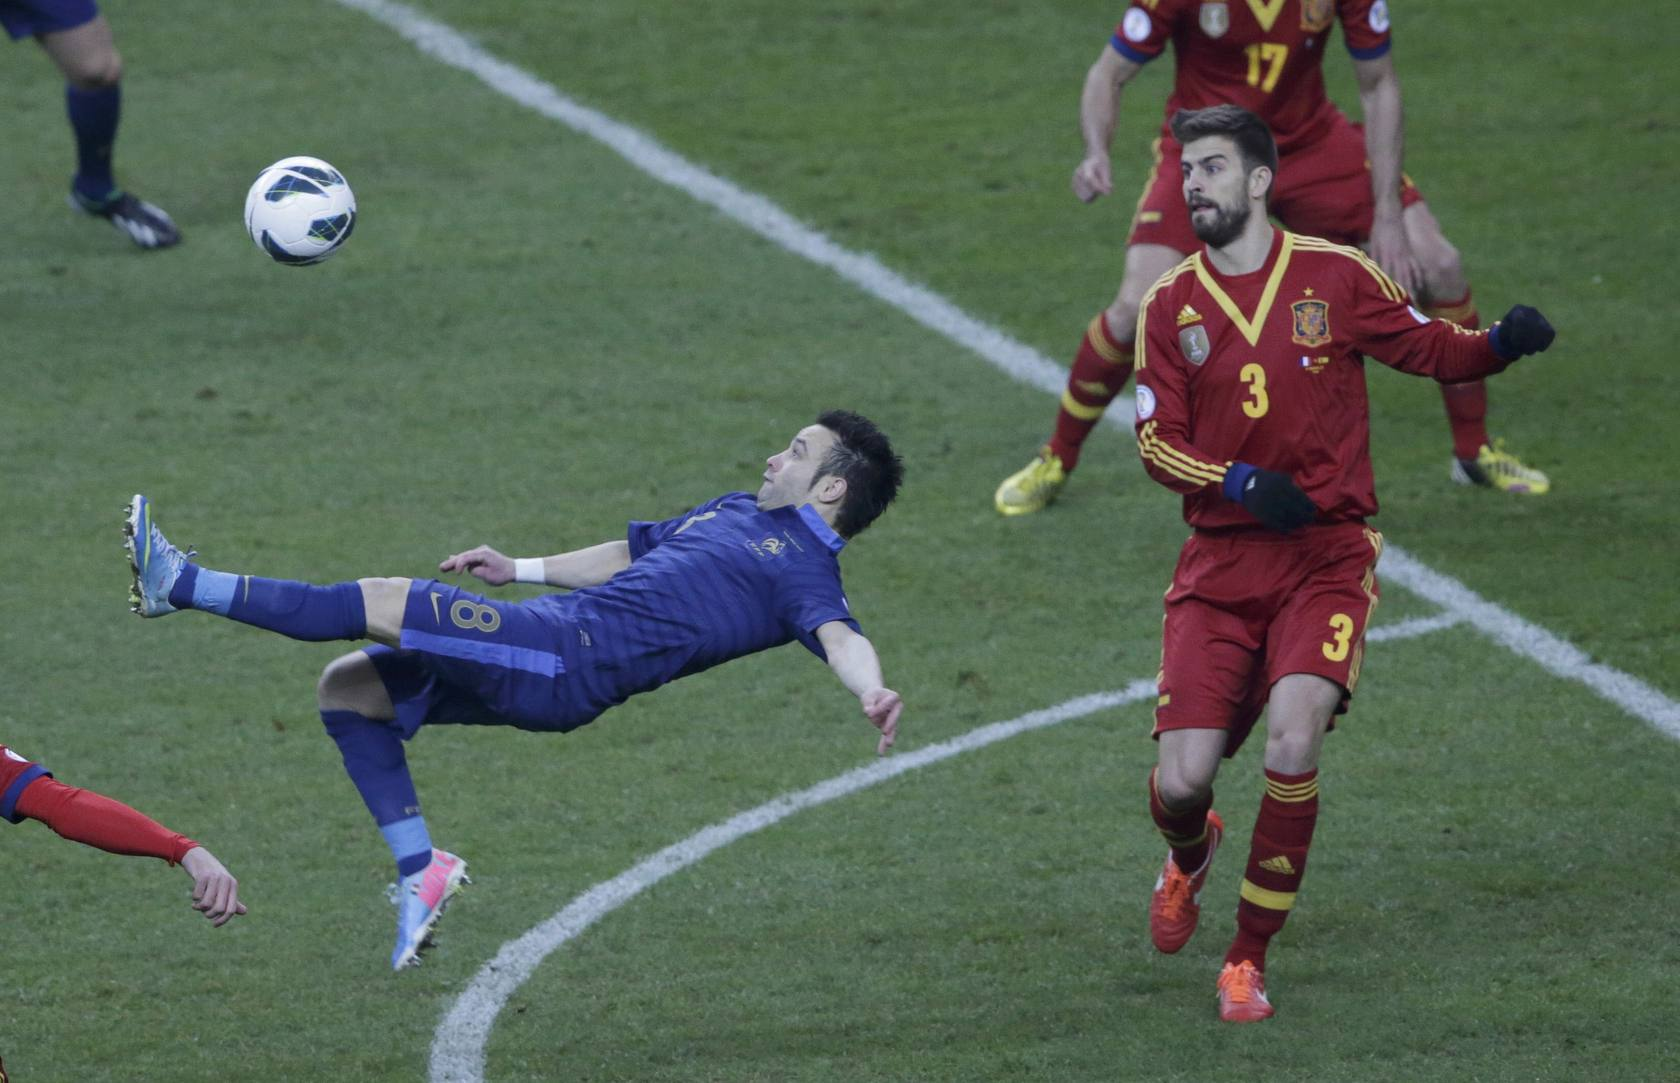 Francia-España (Clasificación para el Mundial de Brasil 2014)